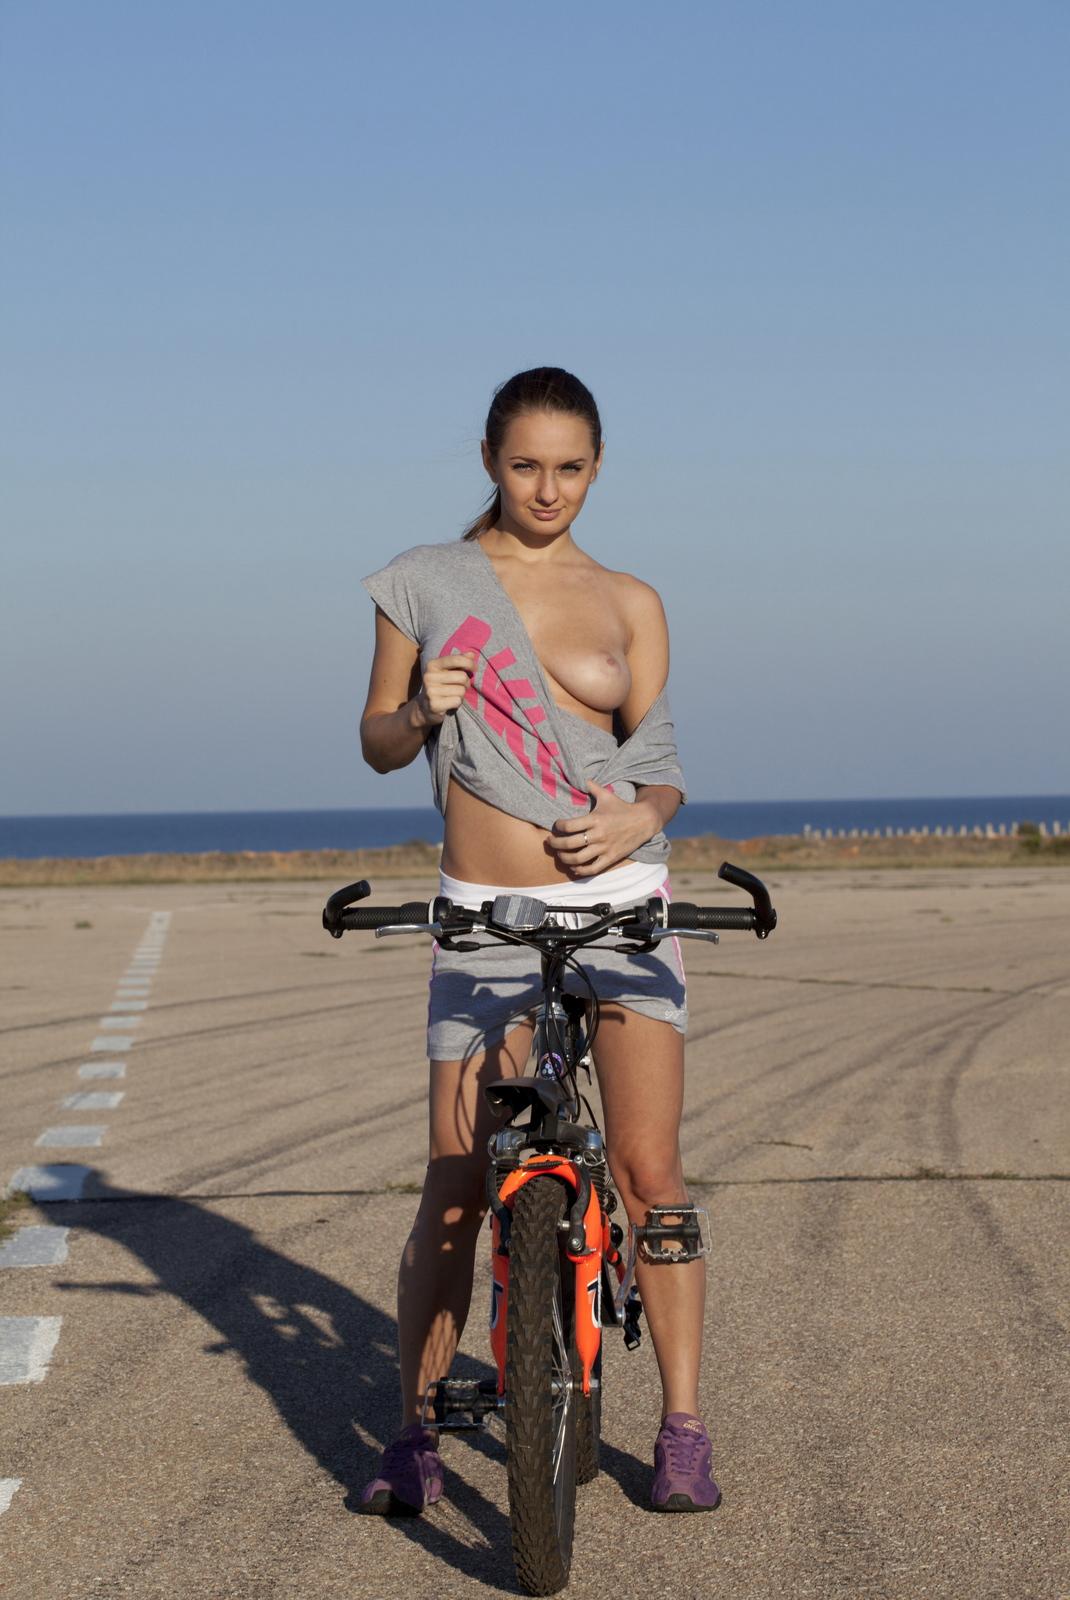 mishel-c-bicycle-boobs-naked-domai-02